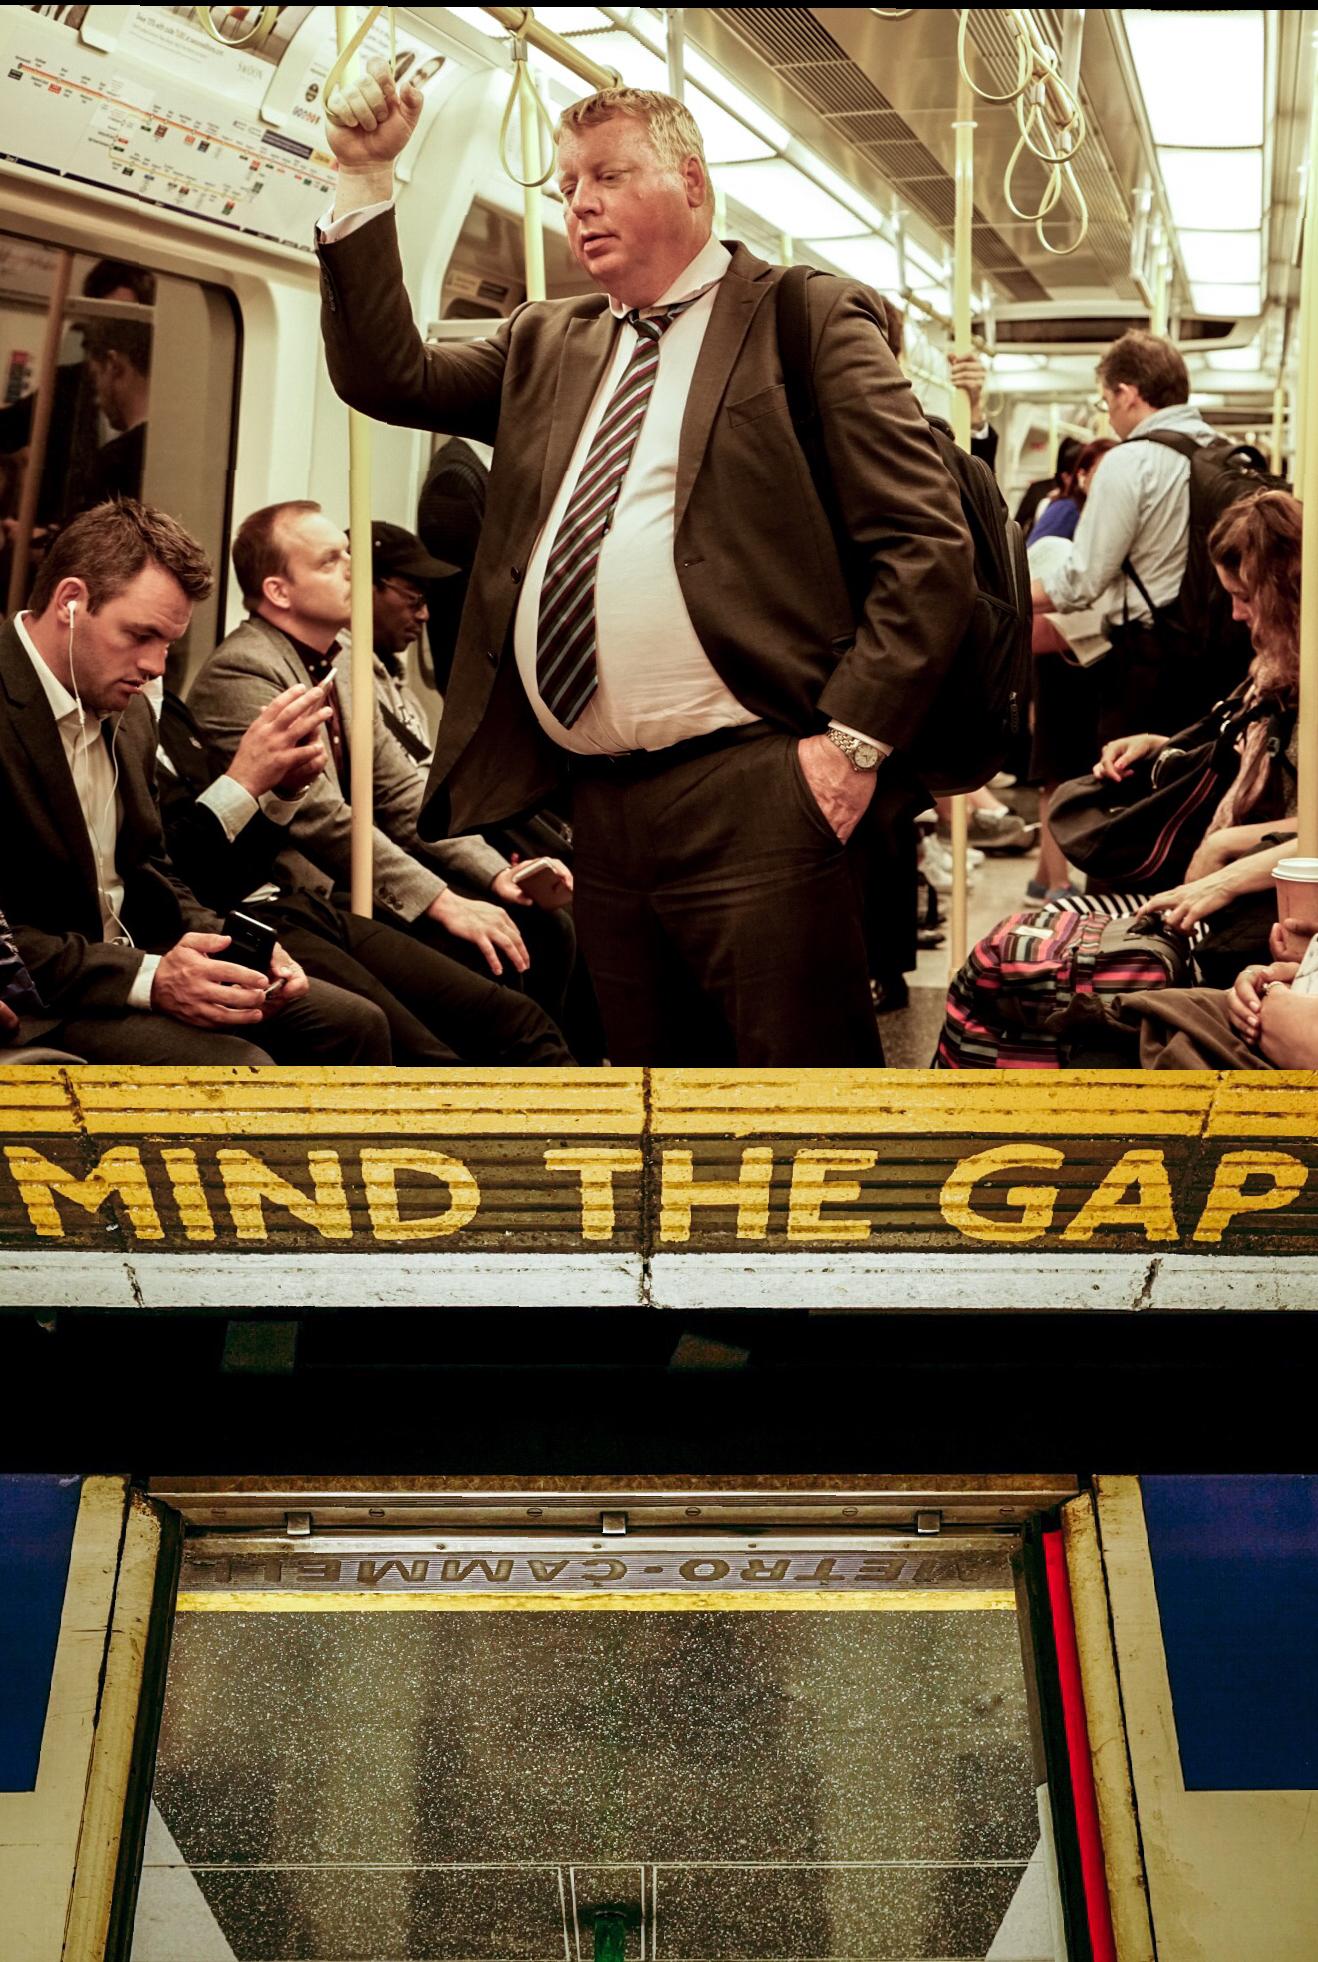 Mind the Gap, Sleppy Man London, U.K.